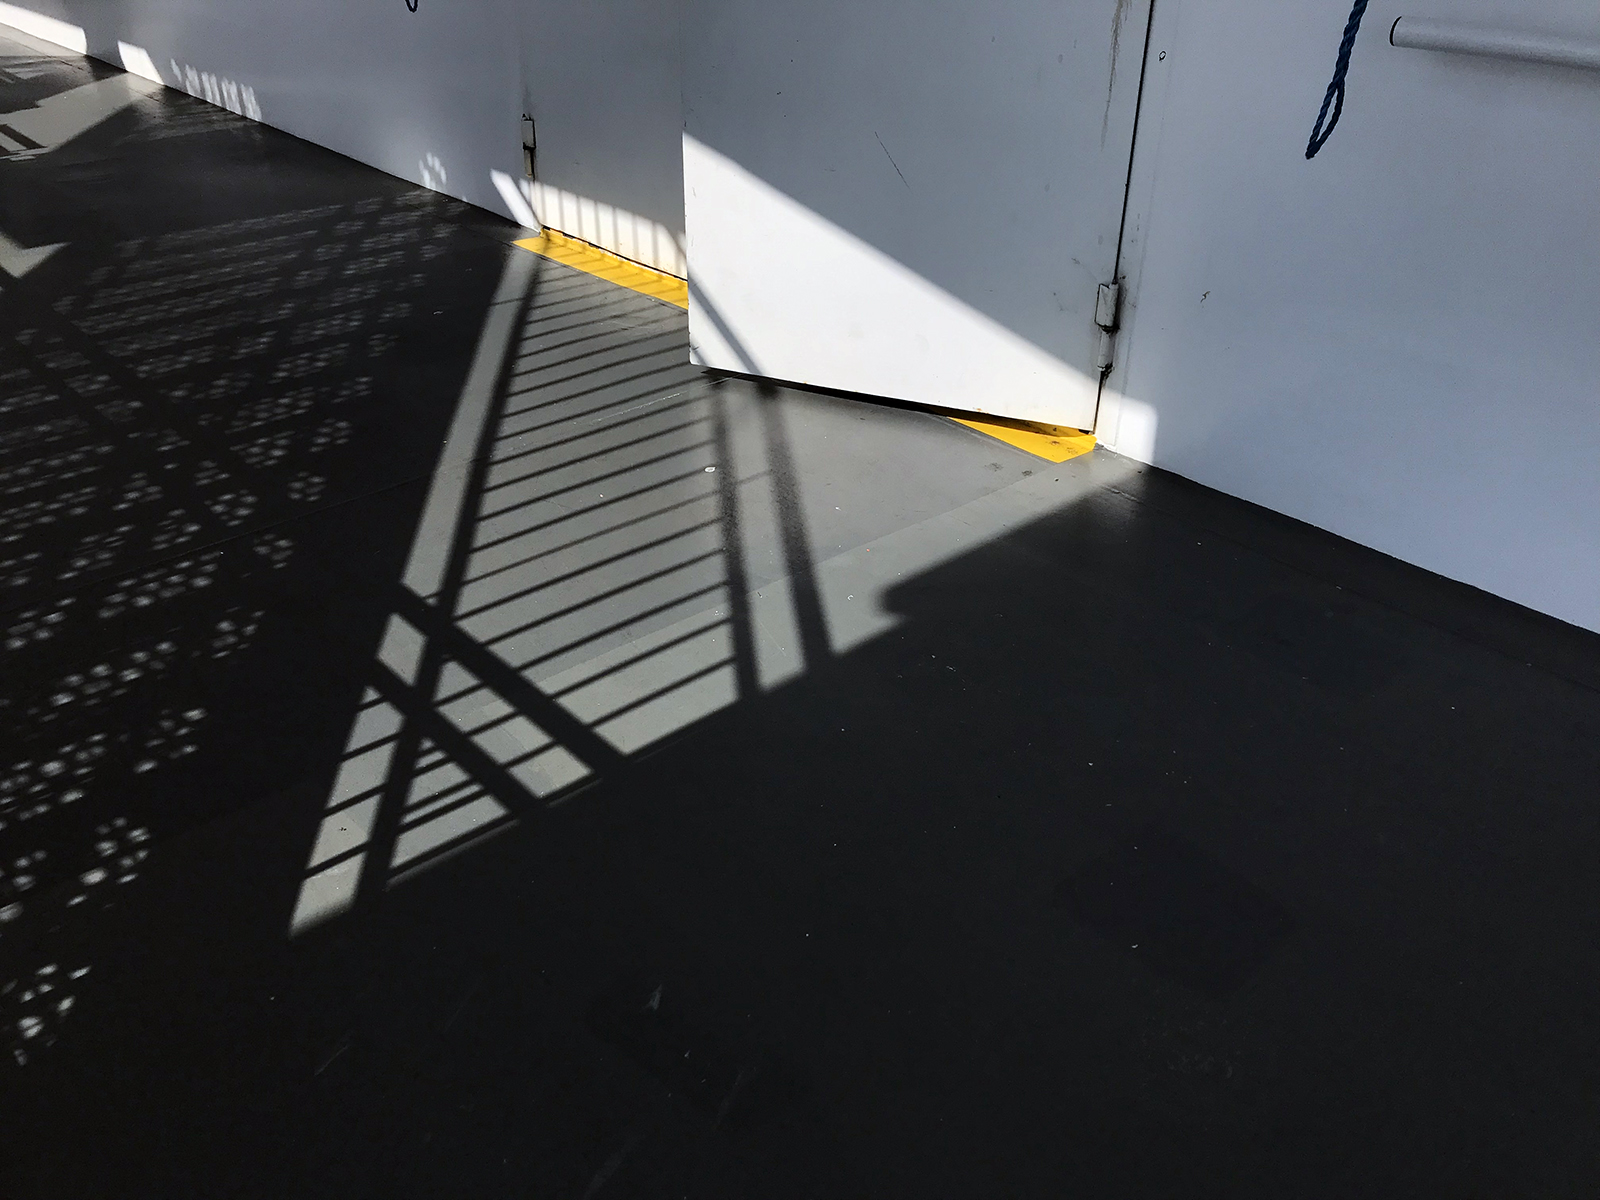 Ground shadows